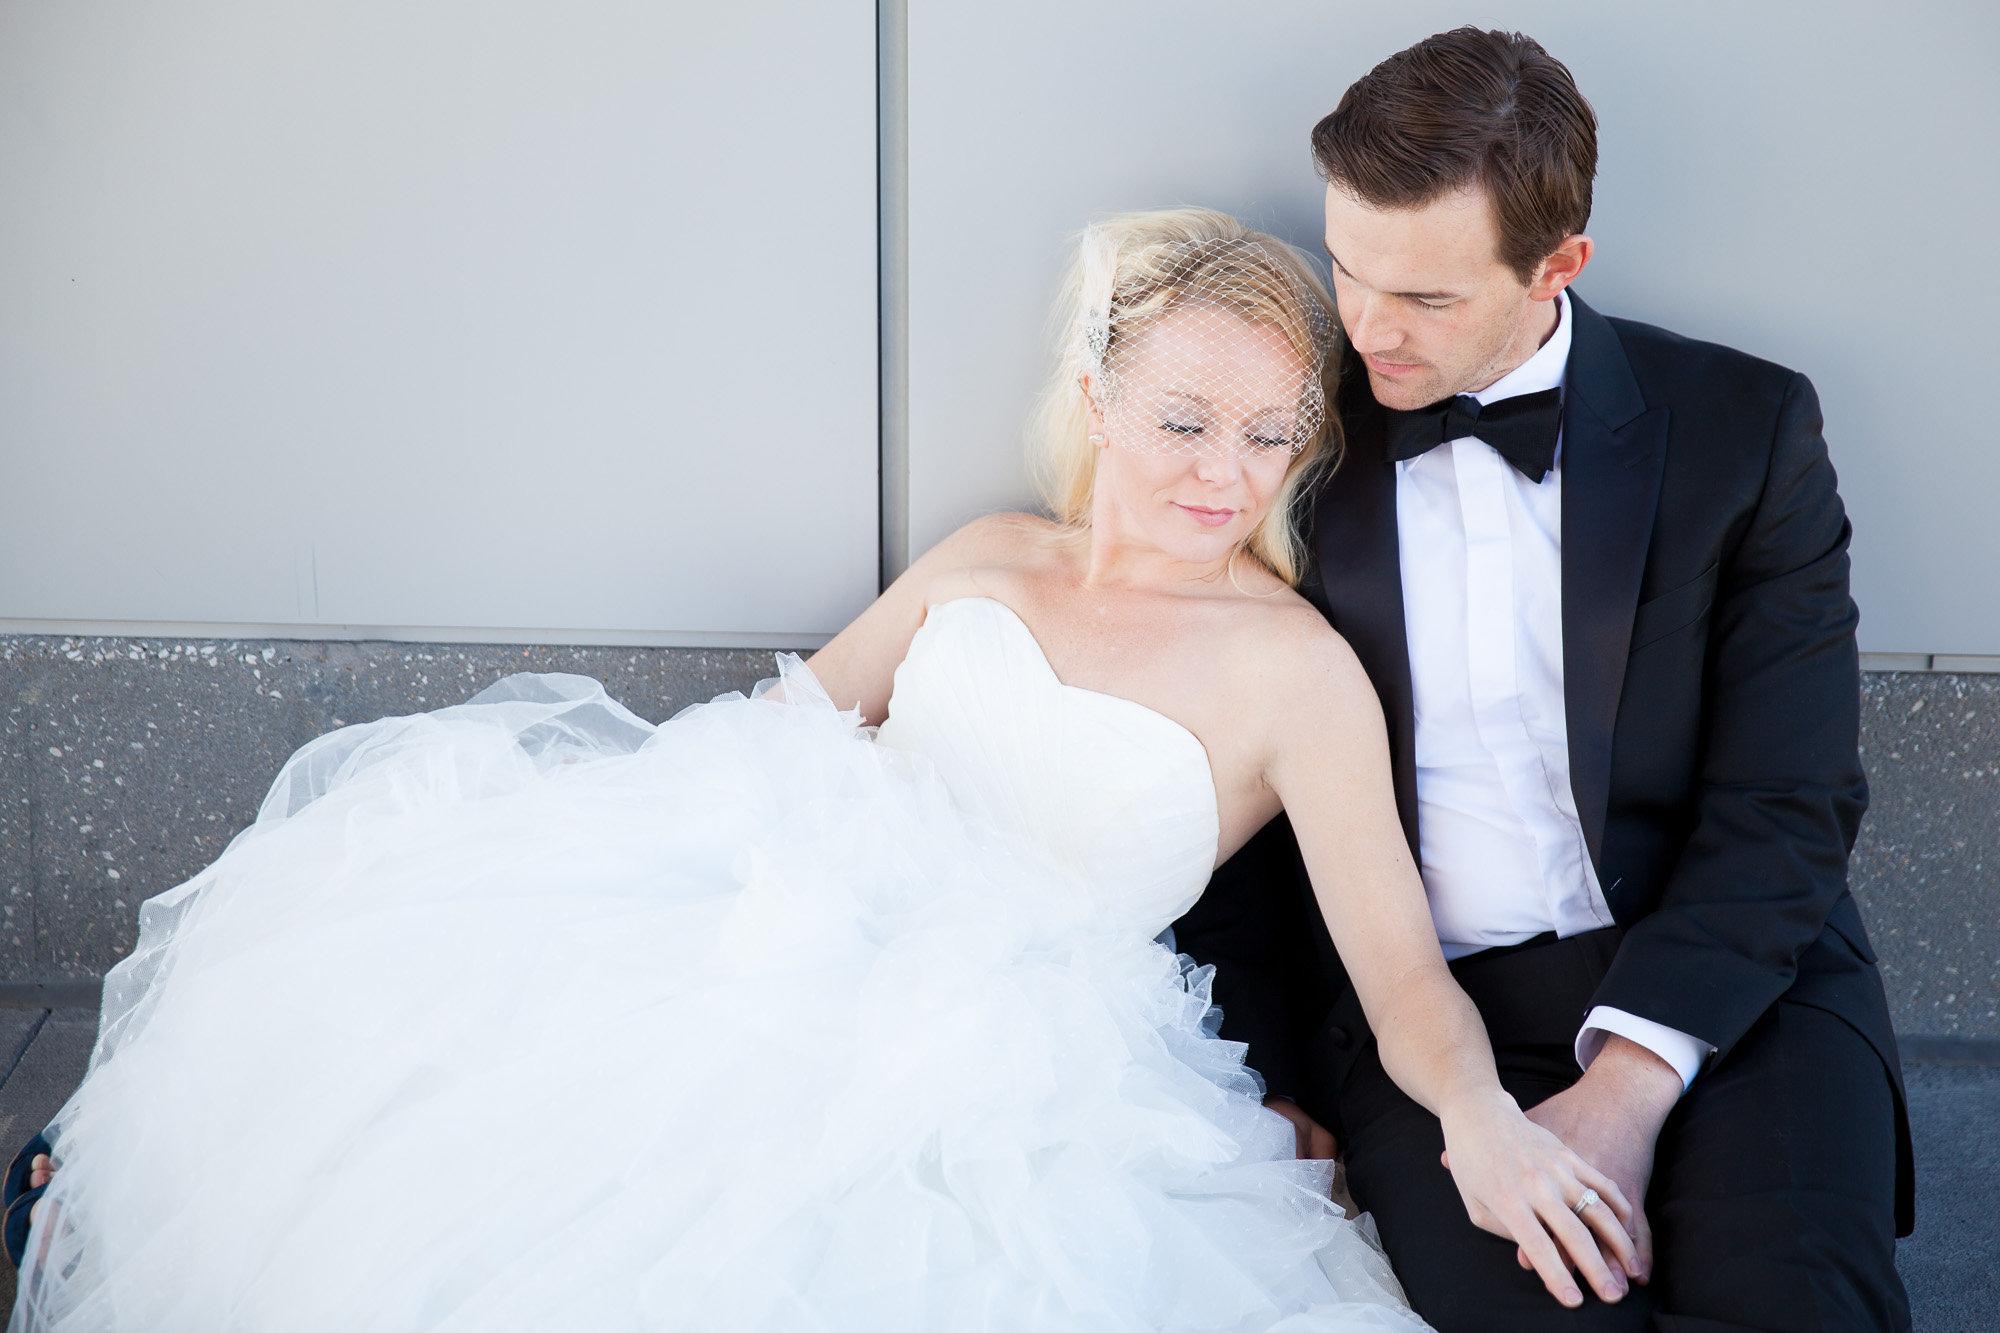 Wedding Example Gallery-Portraits-0025.jpg